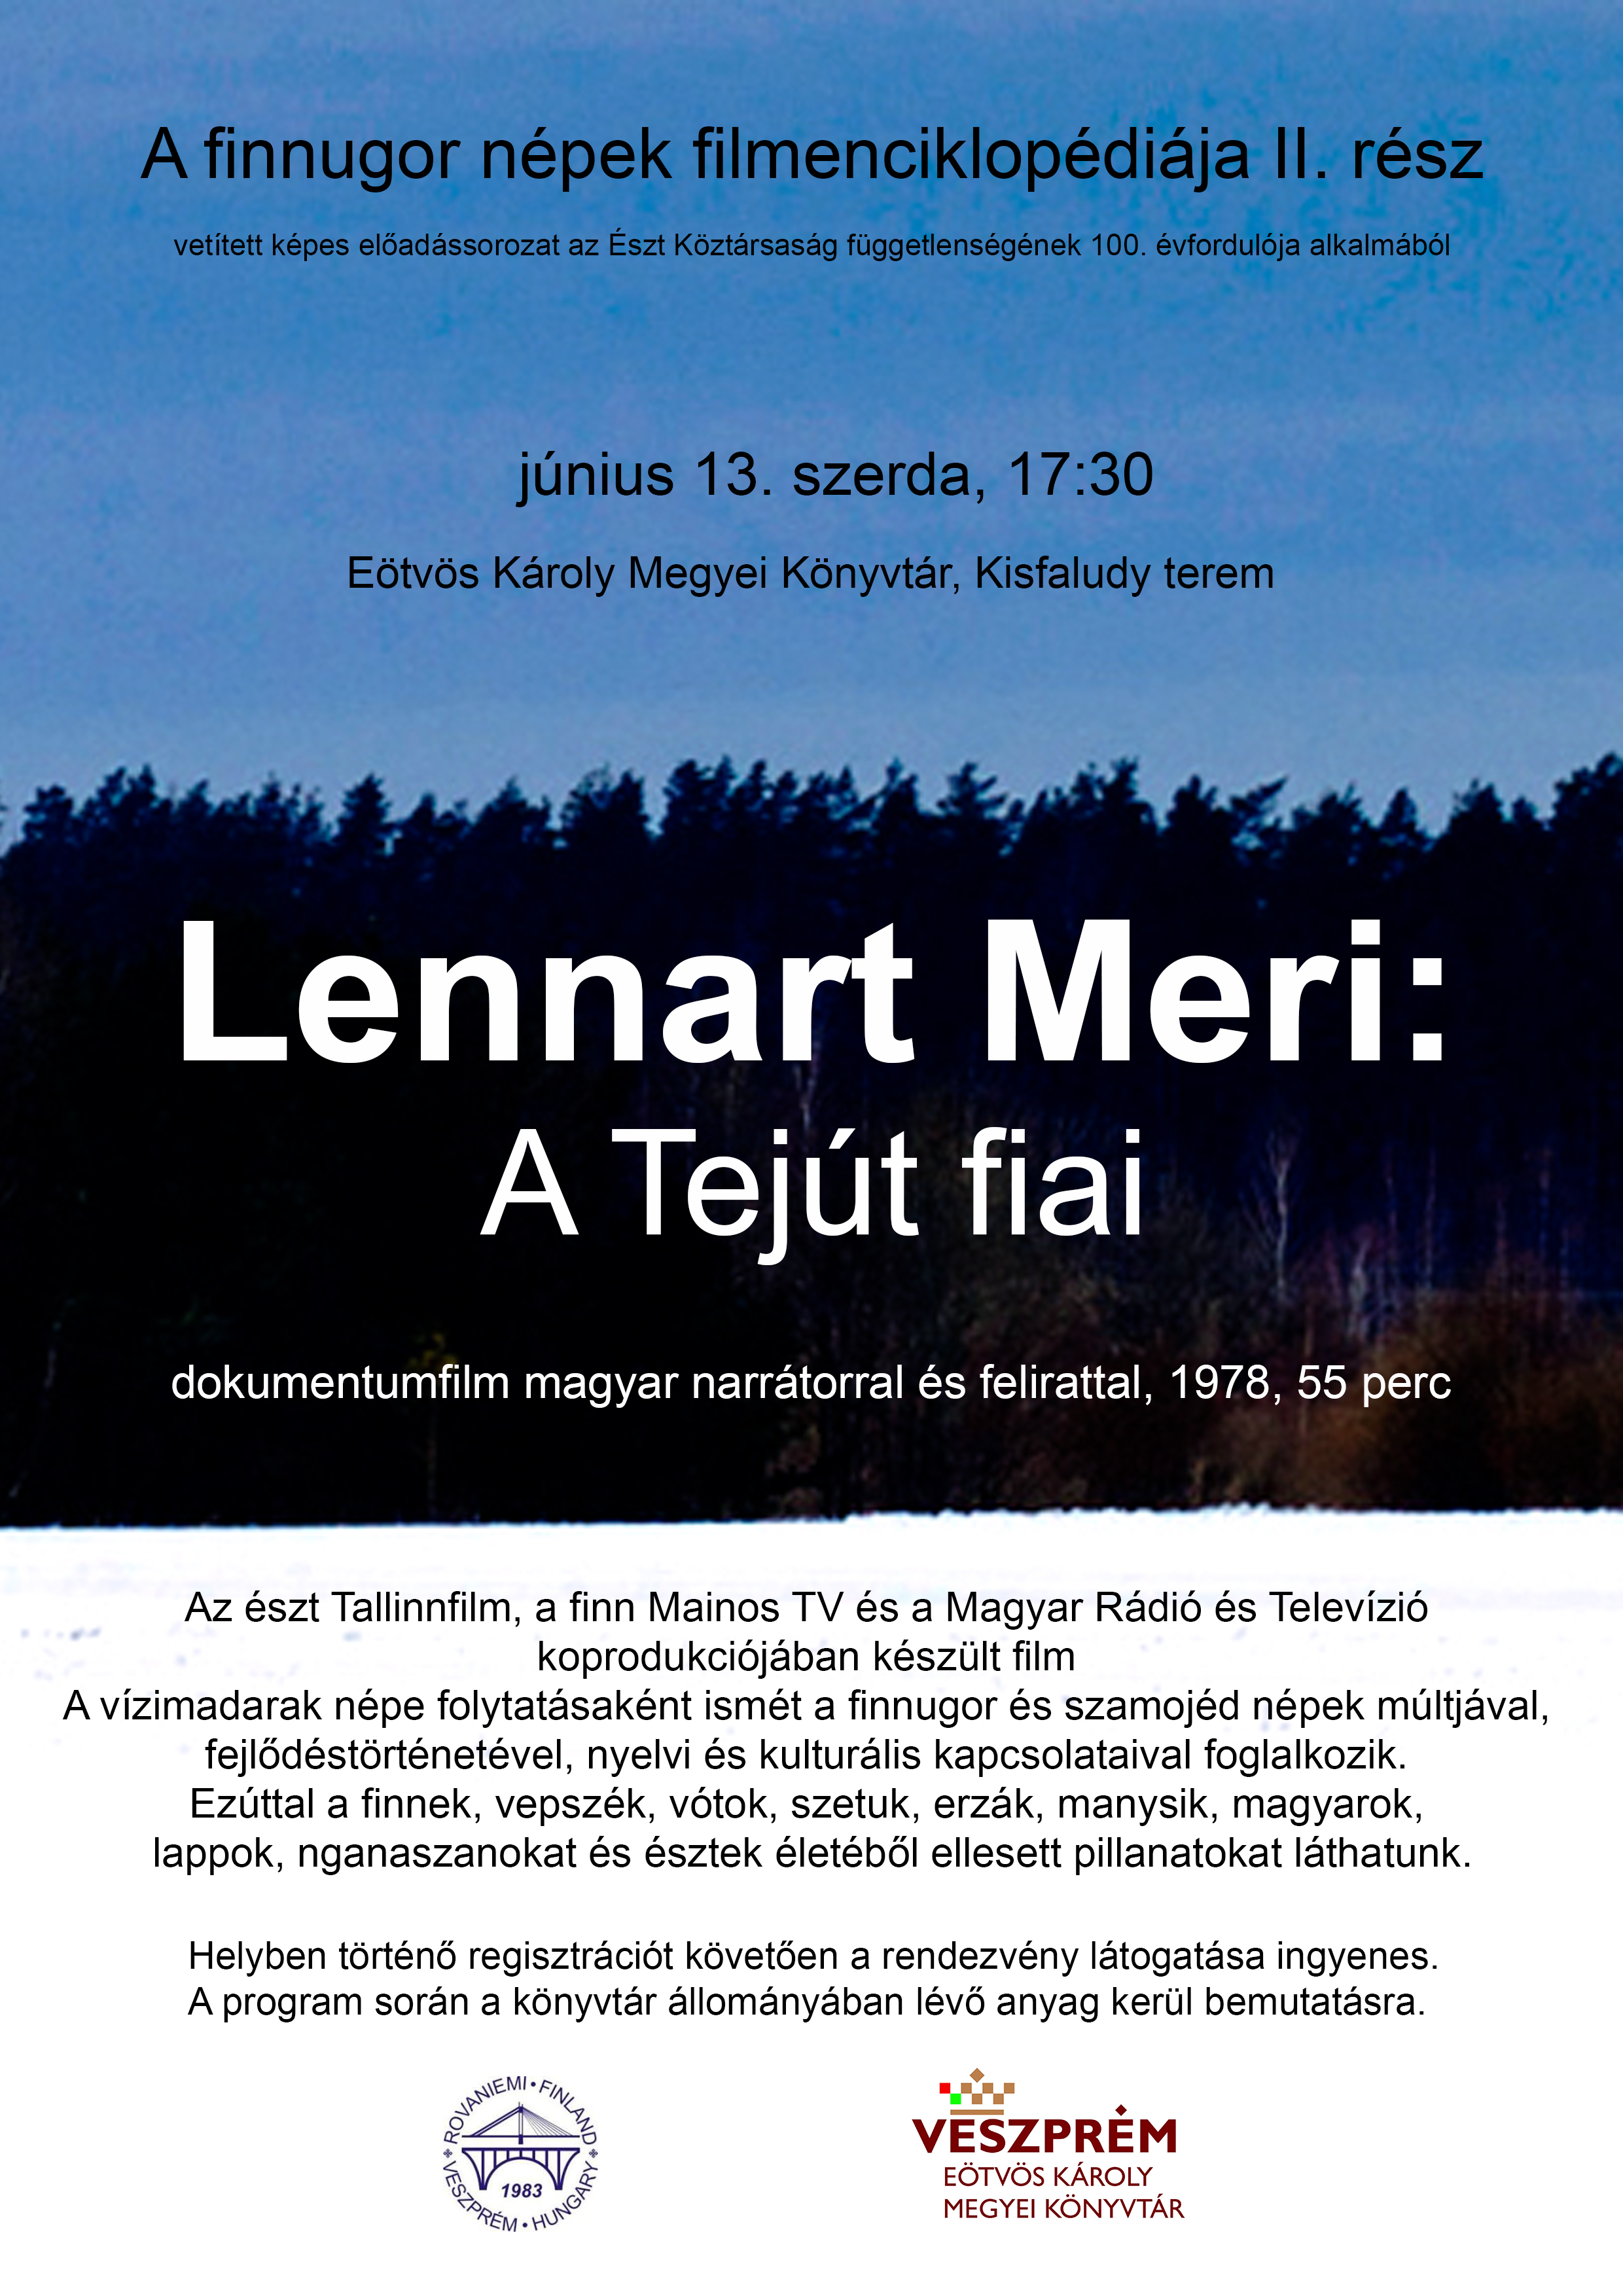 Lennart Meri: A Tejút fiai